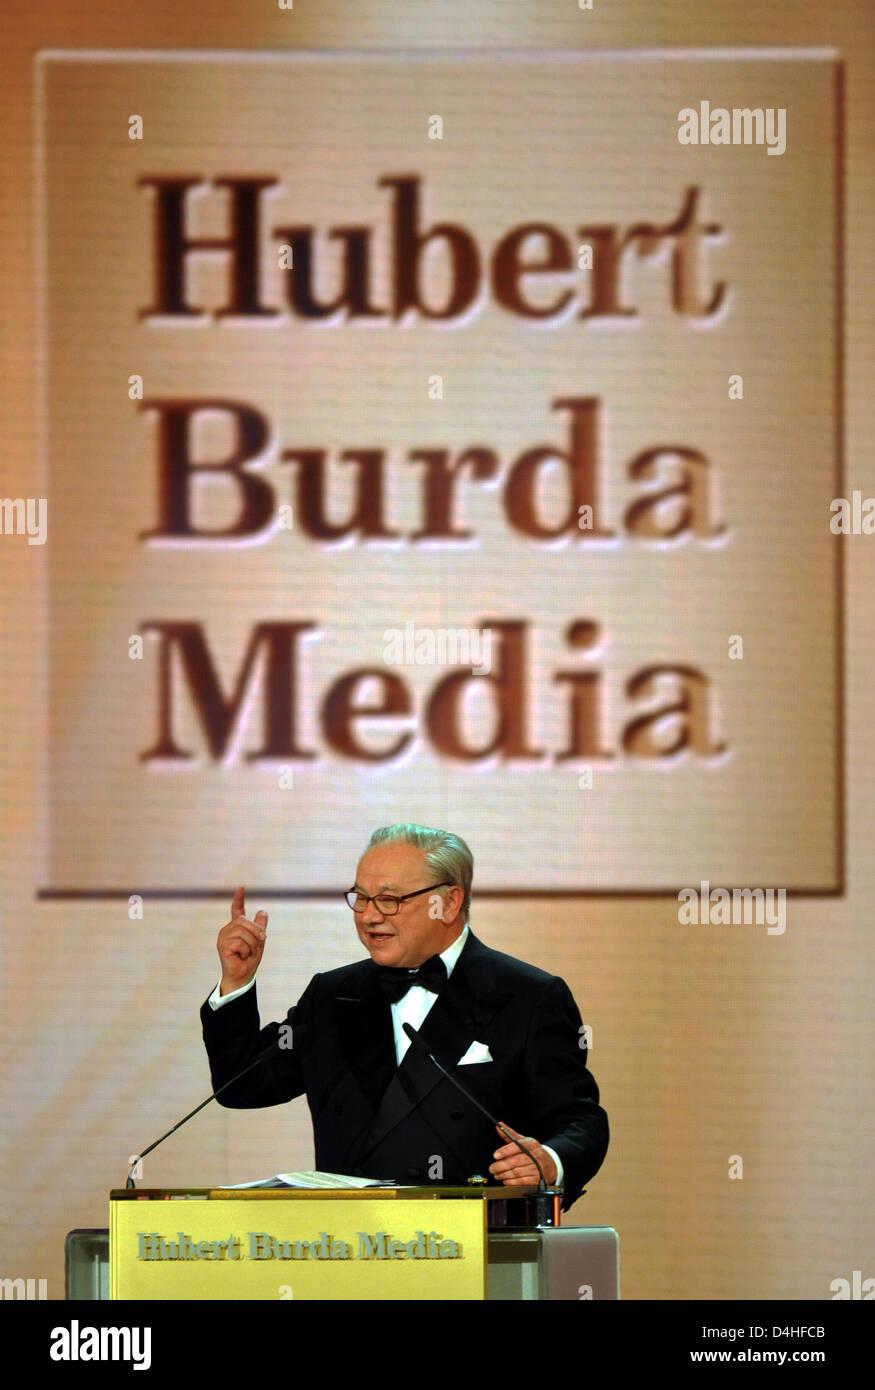 verleger hubert burda begr t die g ste bei der verleihung des bambi media prize 2008 in. Black Bedroom Furniture Sets. Home Design Ideas